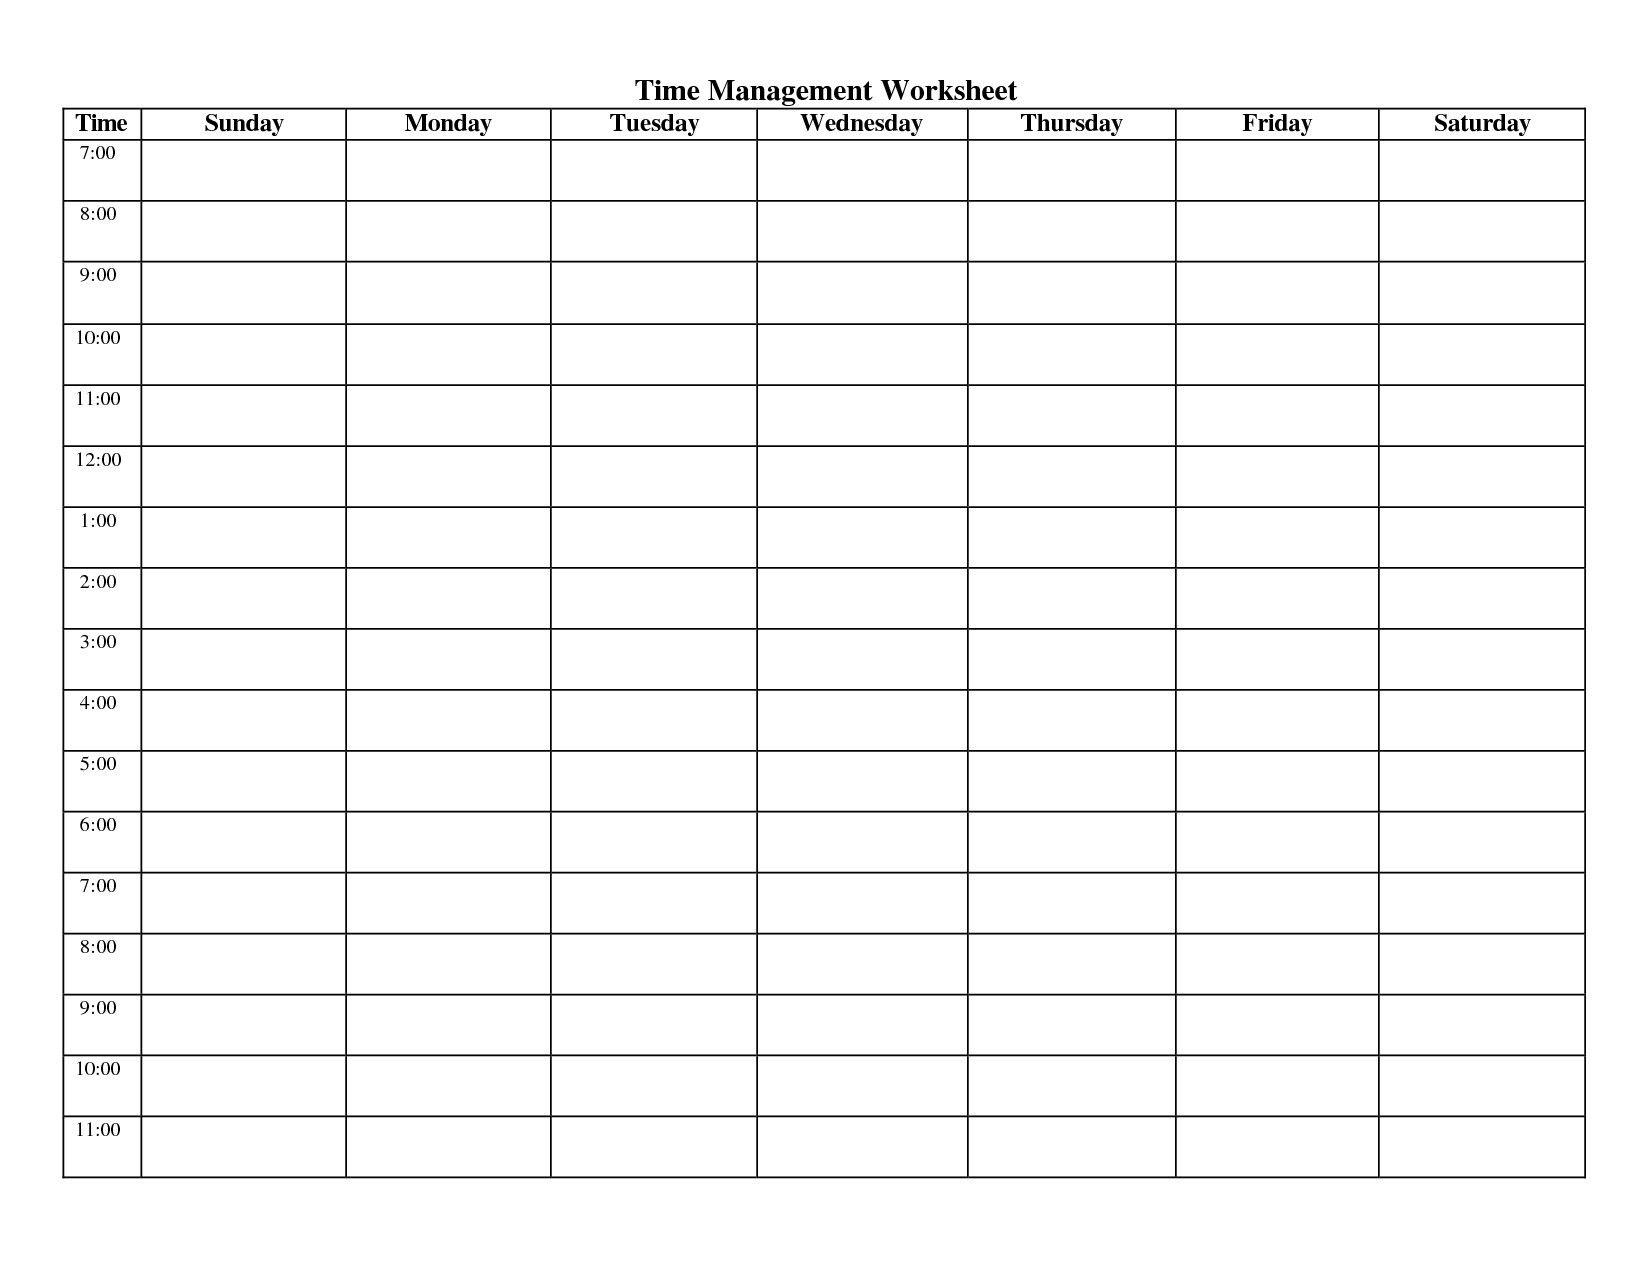 Calendar 24 Hour Weekly Template Unbelievable On Weekly Calendar With Hours Template Weekly Calendar Template Calendar Template Daily Calendar Template